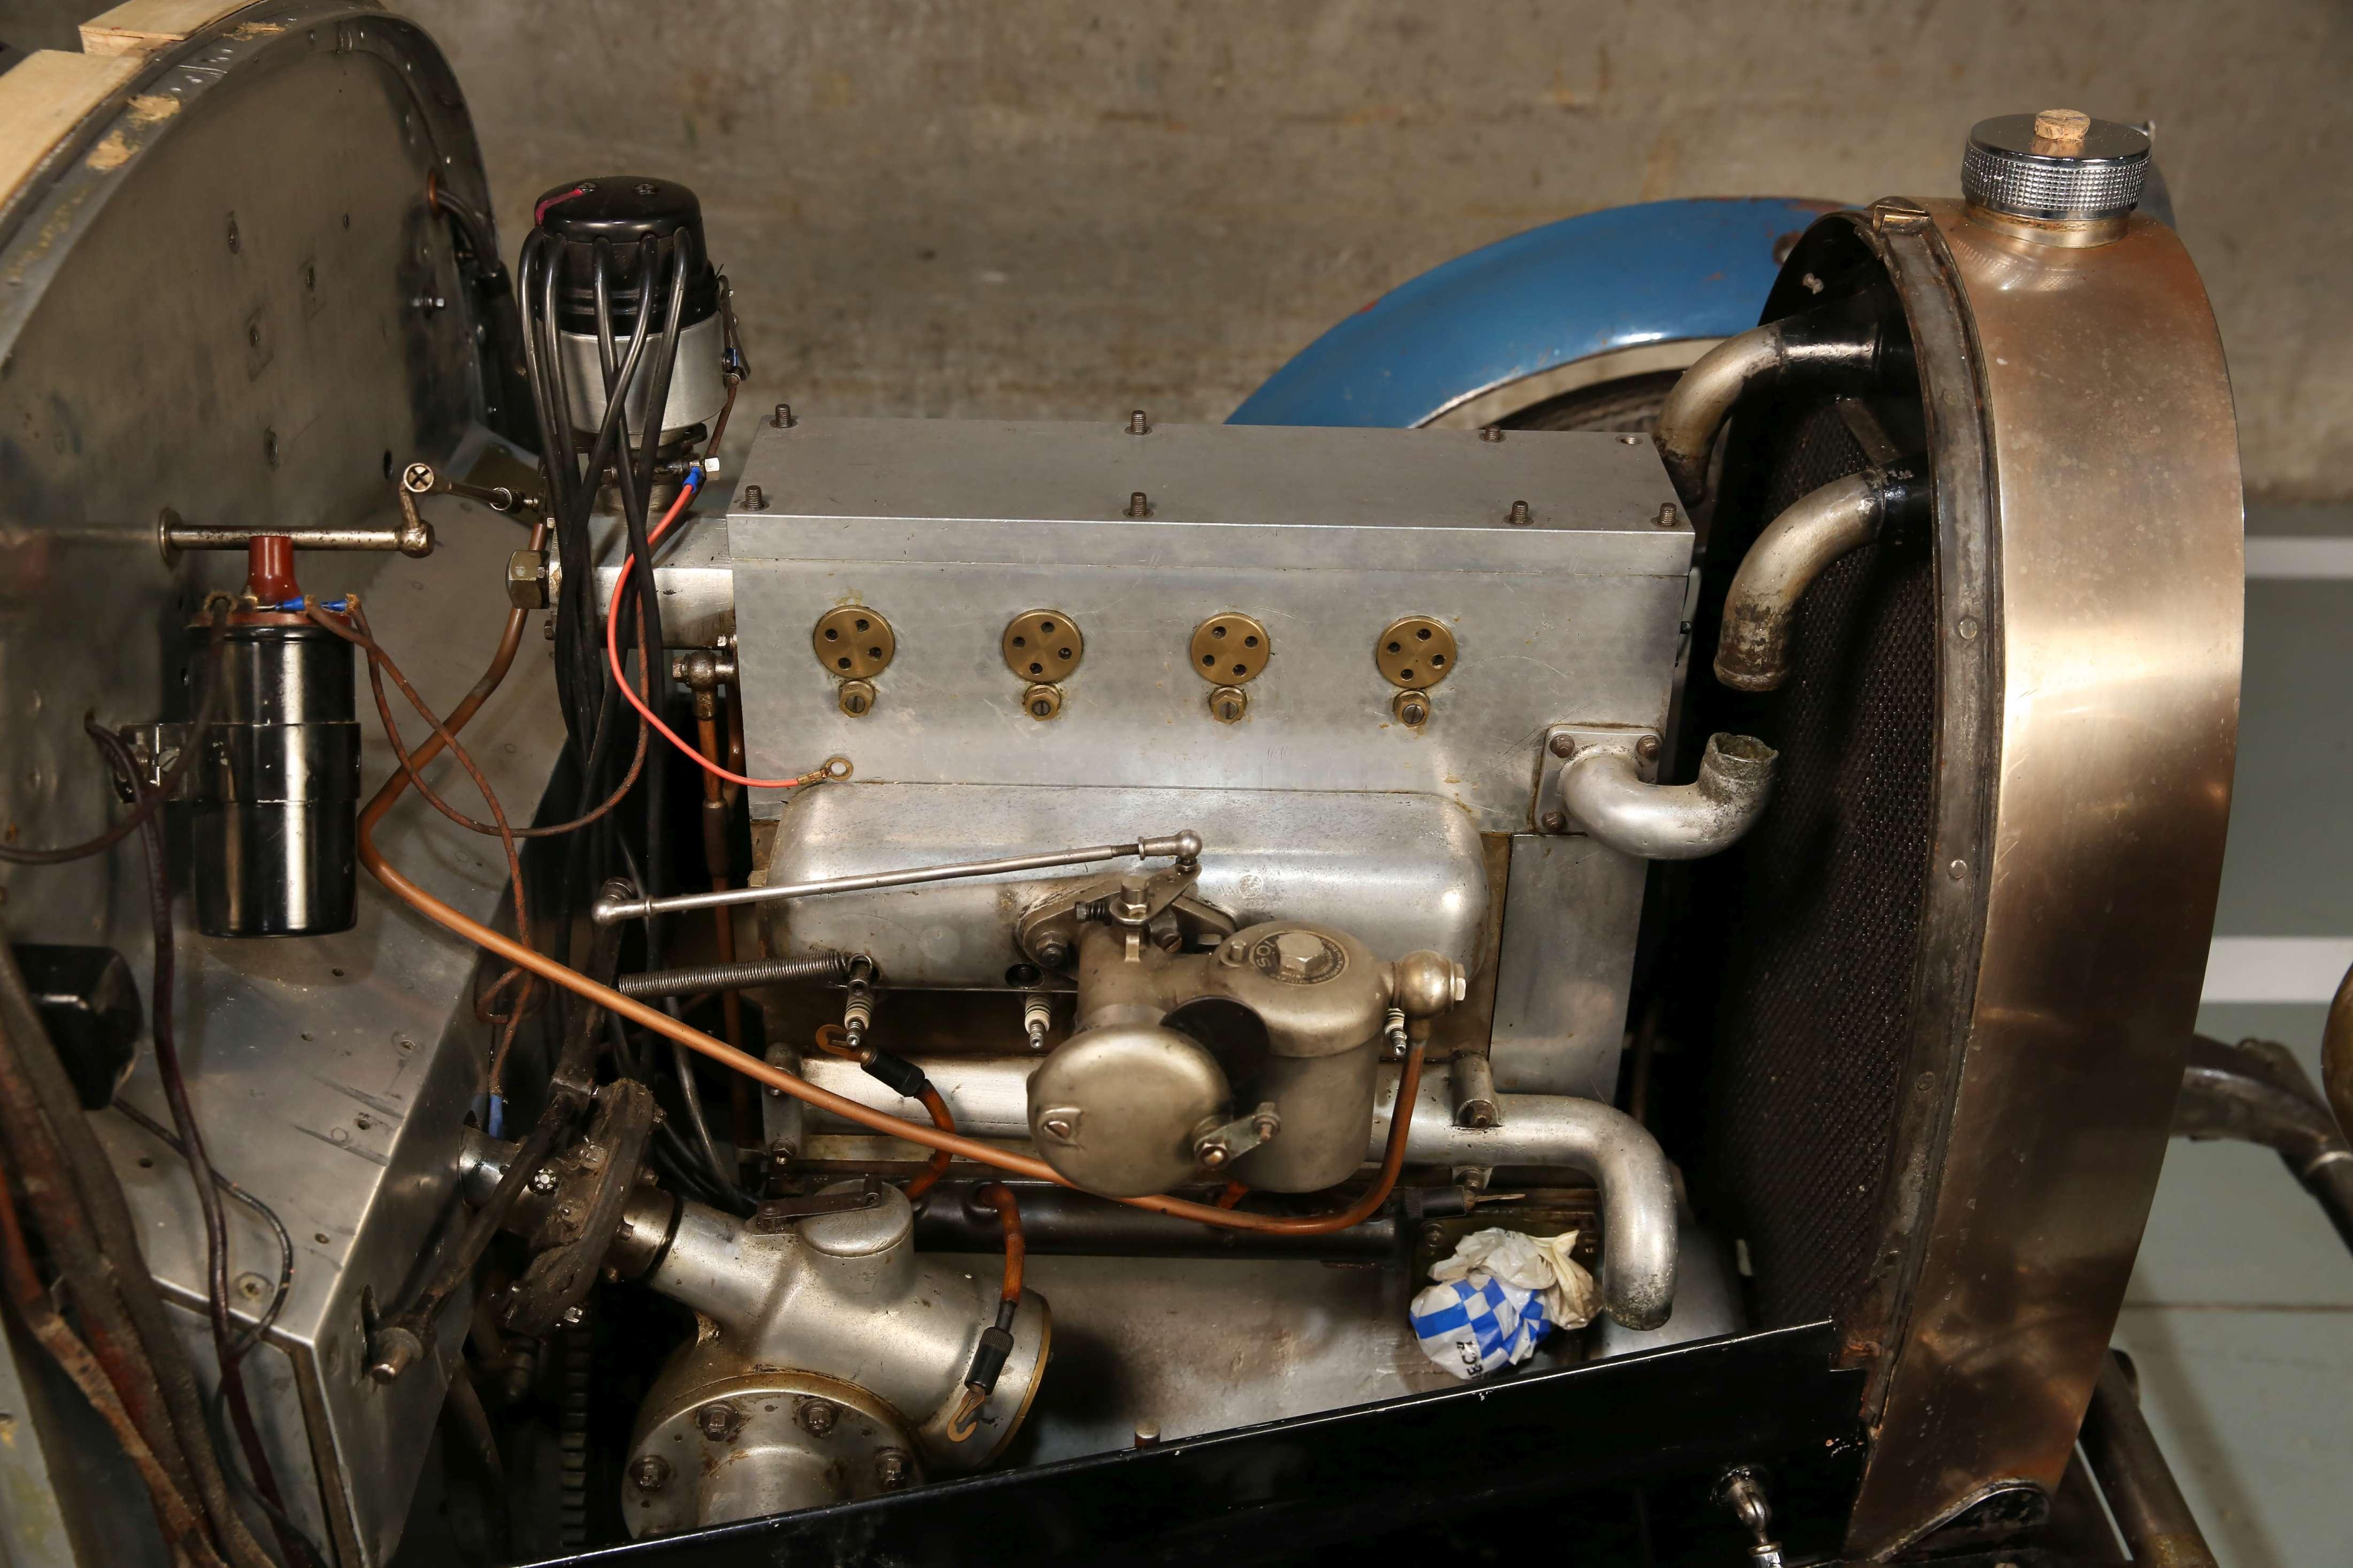 1929 Bugatti Type 40 engine